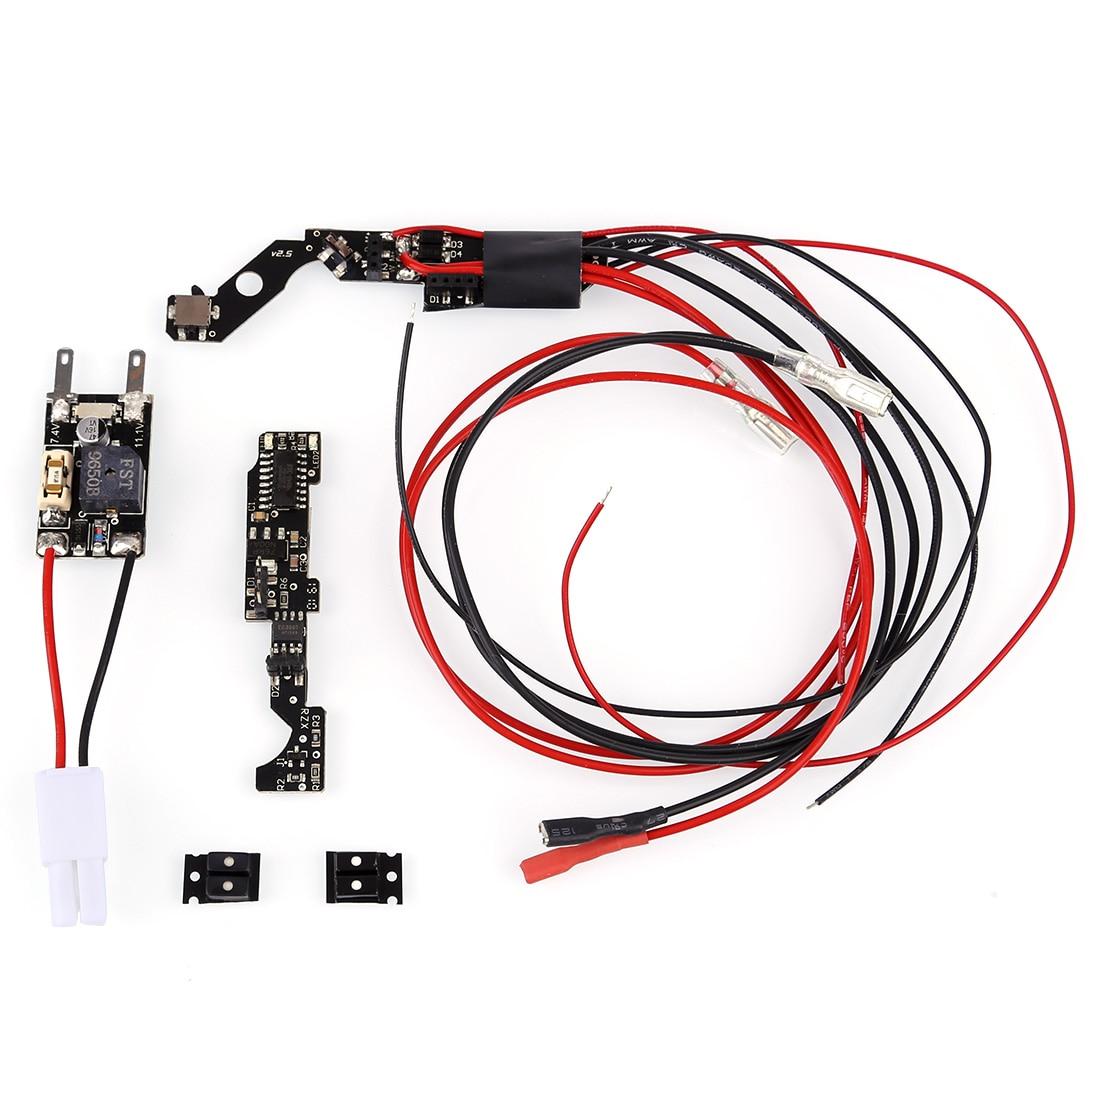 Rowsfire 1Pcs StrikeMaster Ⅲ Electronic Fire Control Unit Module Chip For JM J11-AK47 Tactical / RX AKM Water Gel Beads Blaster